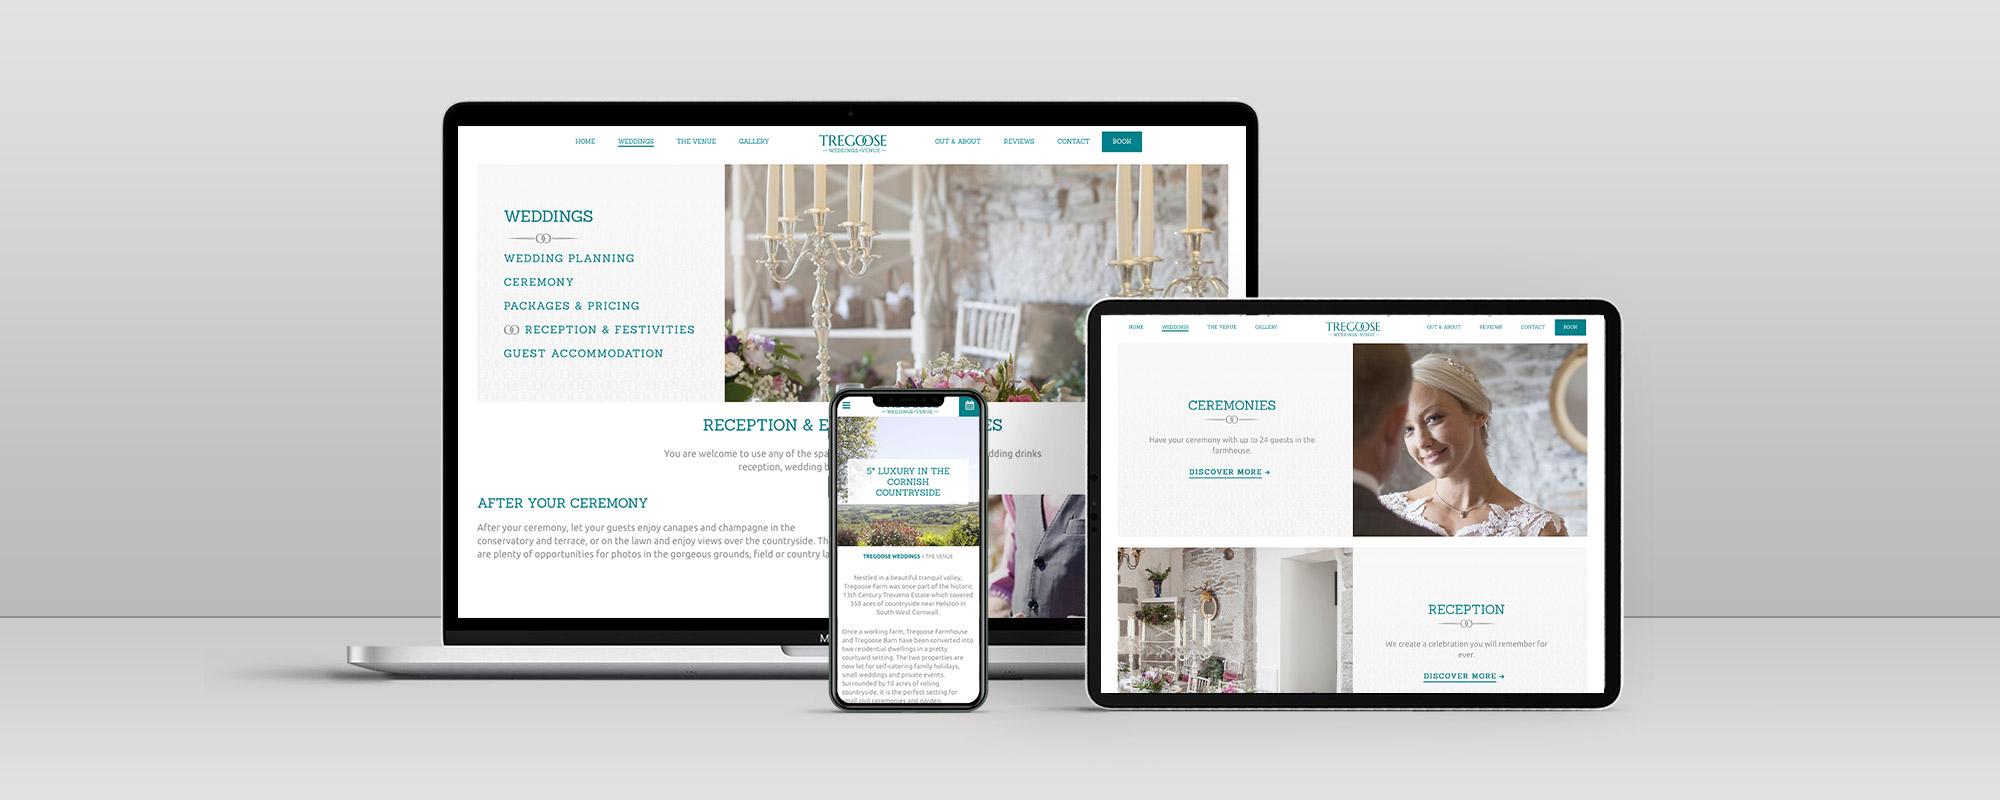 Tregoose Weddings Wordpress Website Design on 3 Devices